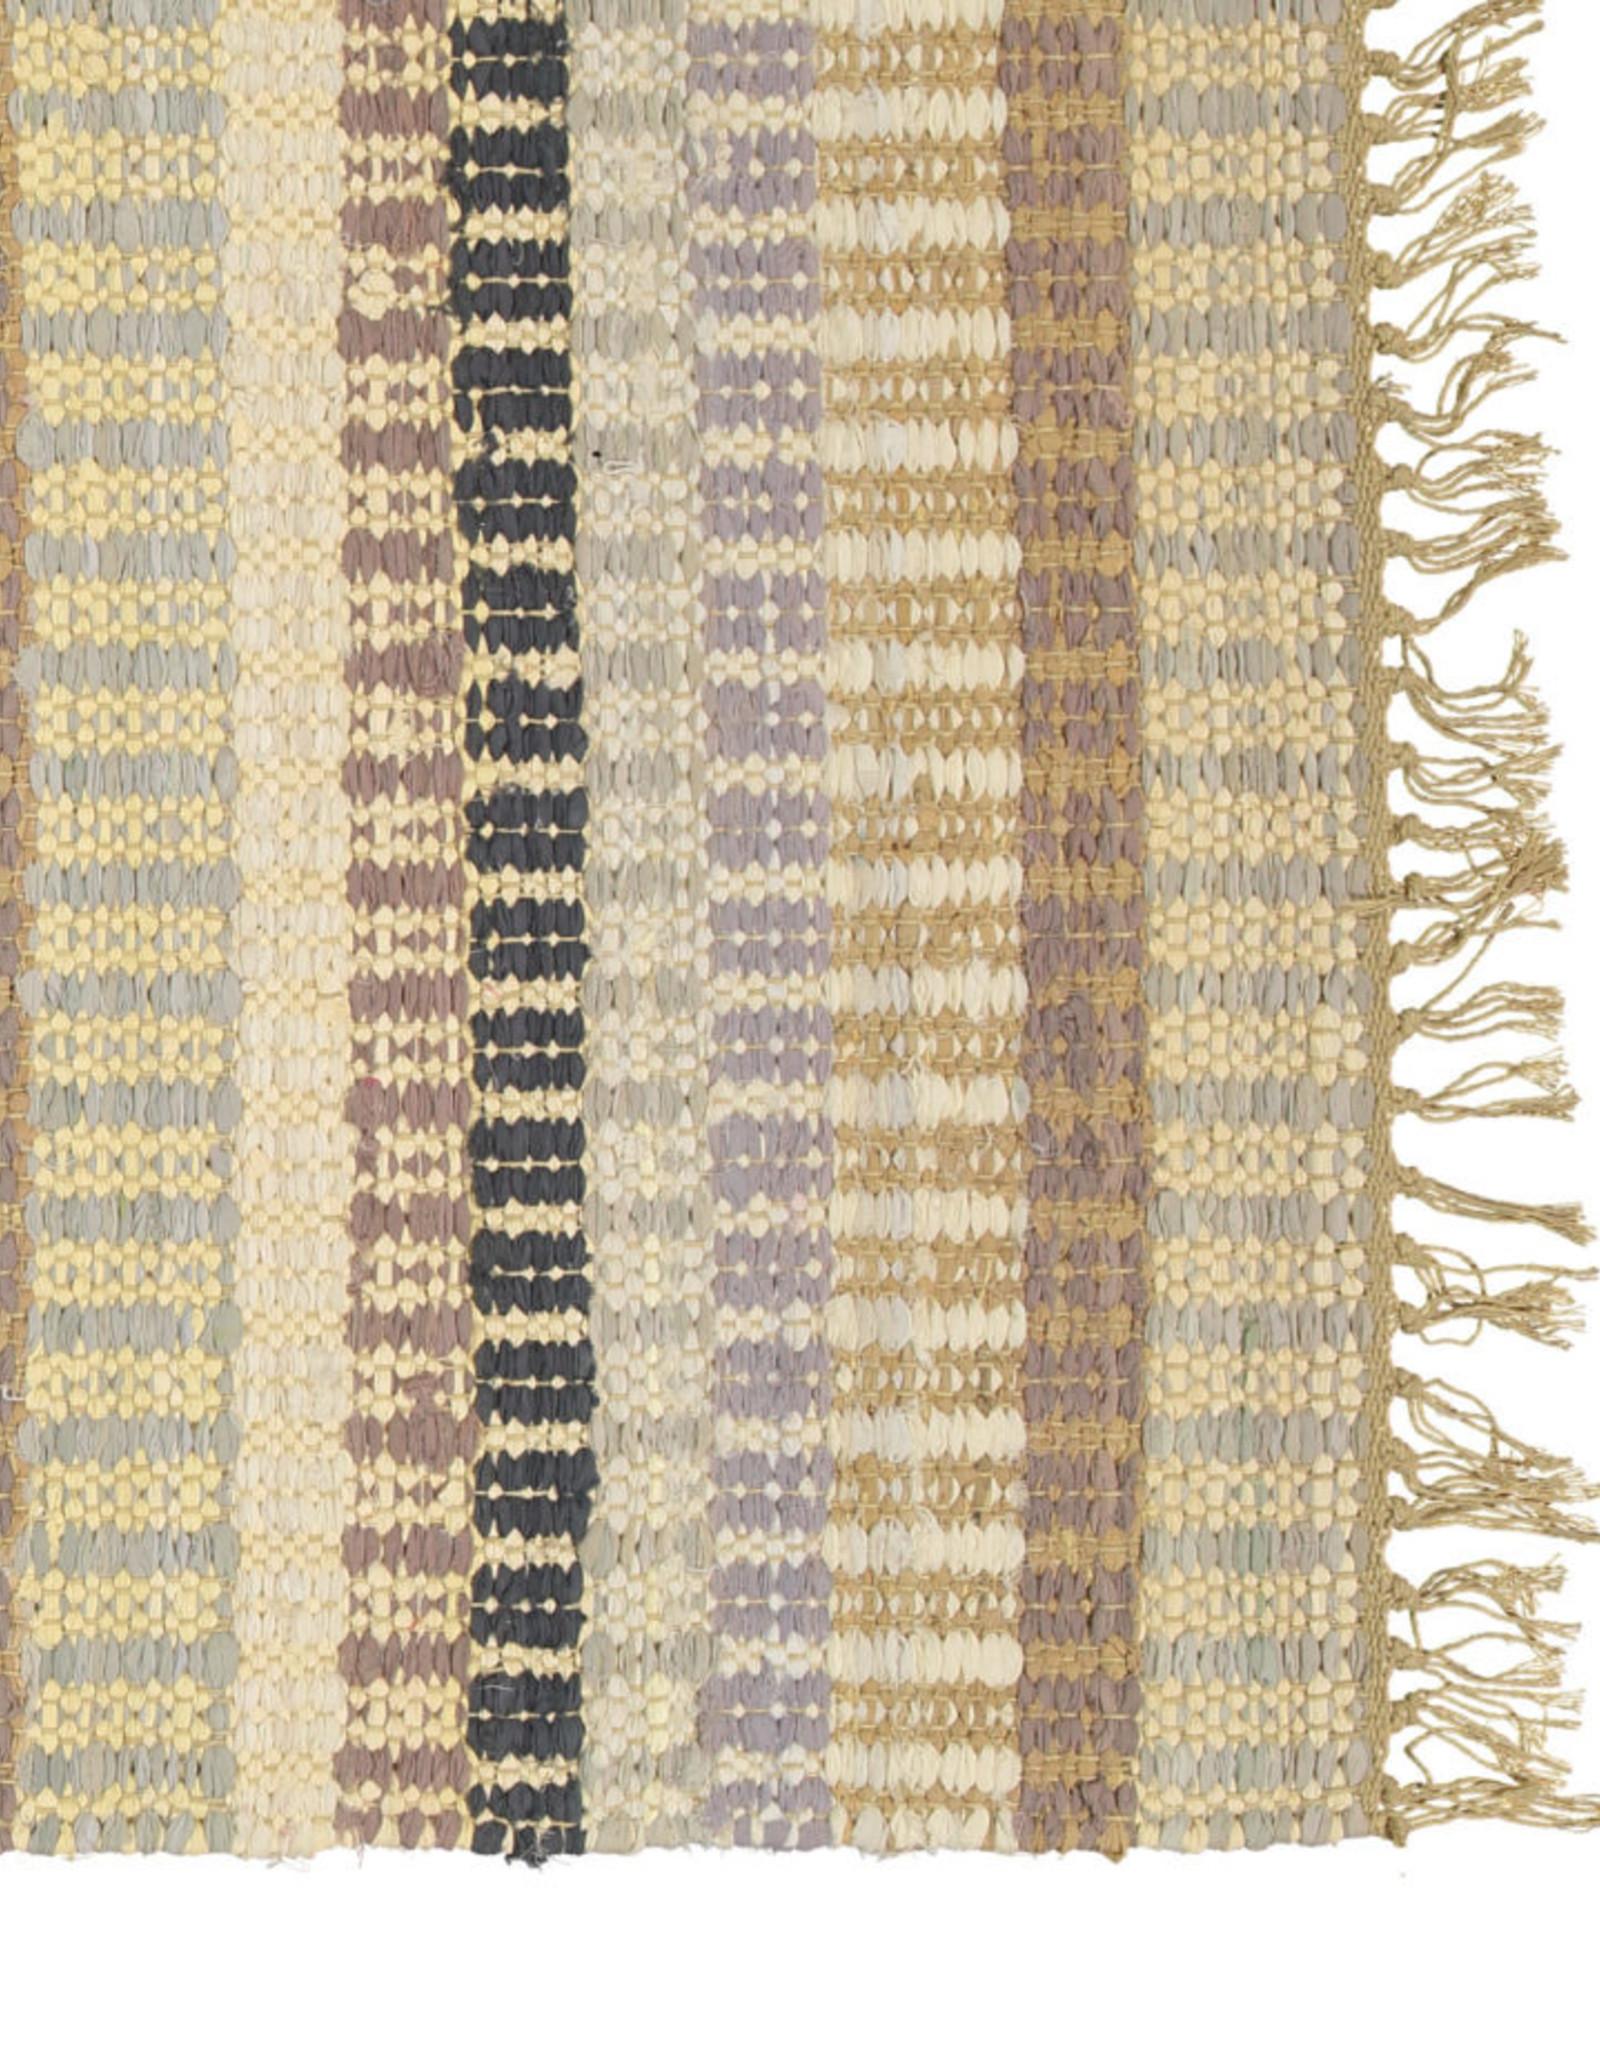 Finarte 'Huvila' rug recycled cotton